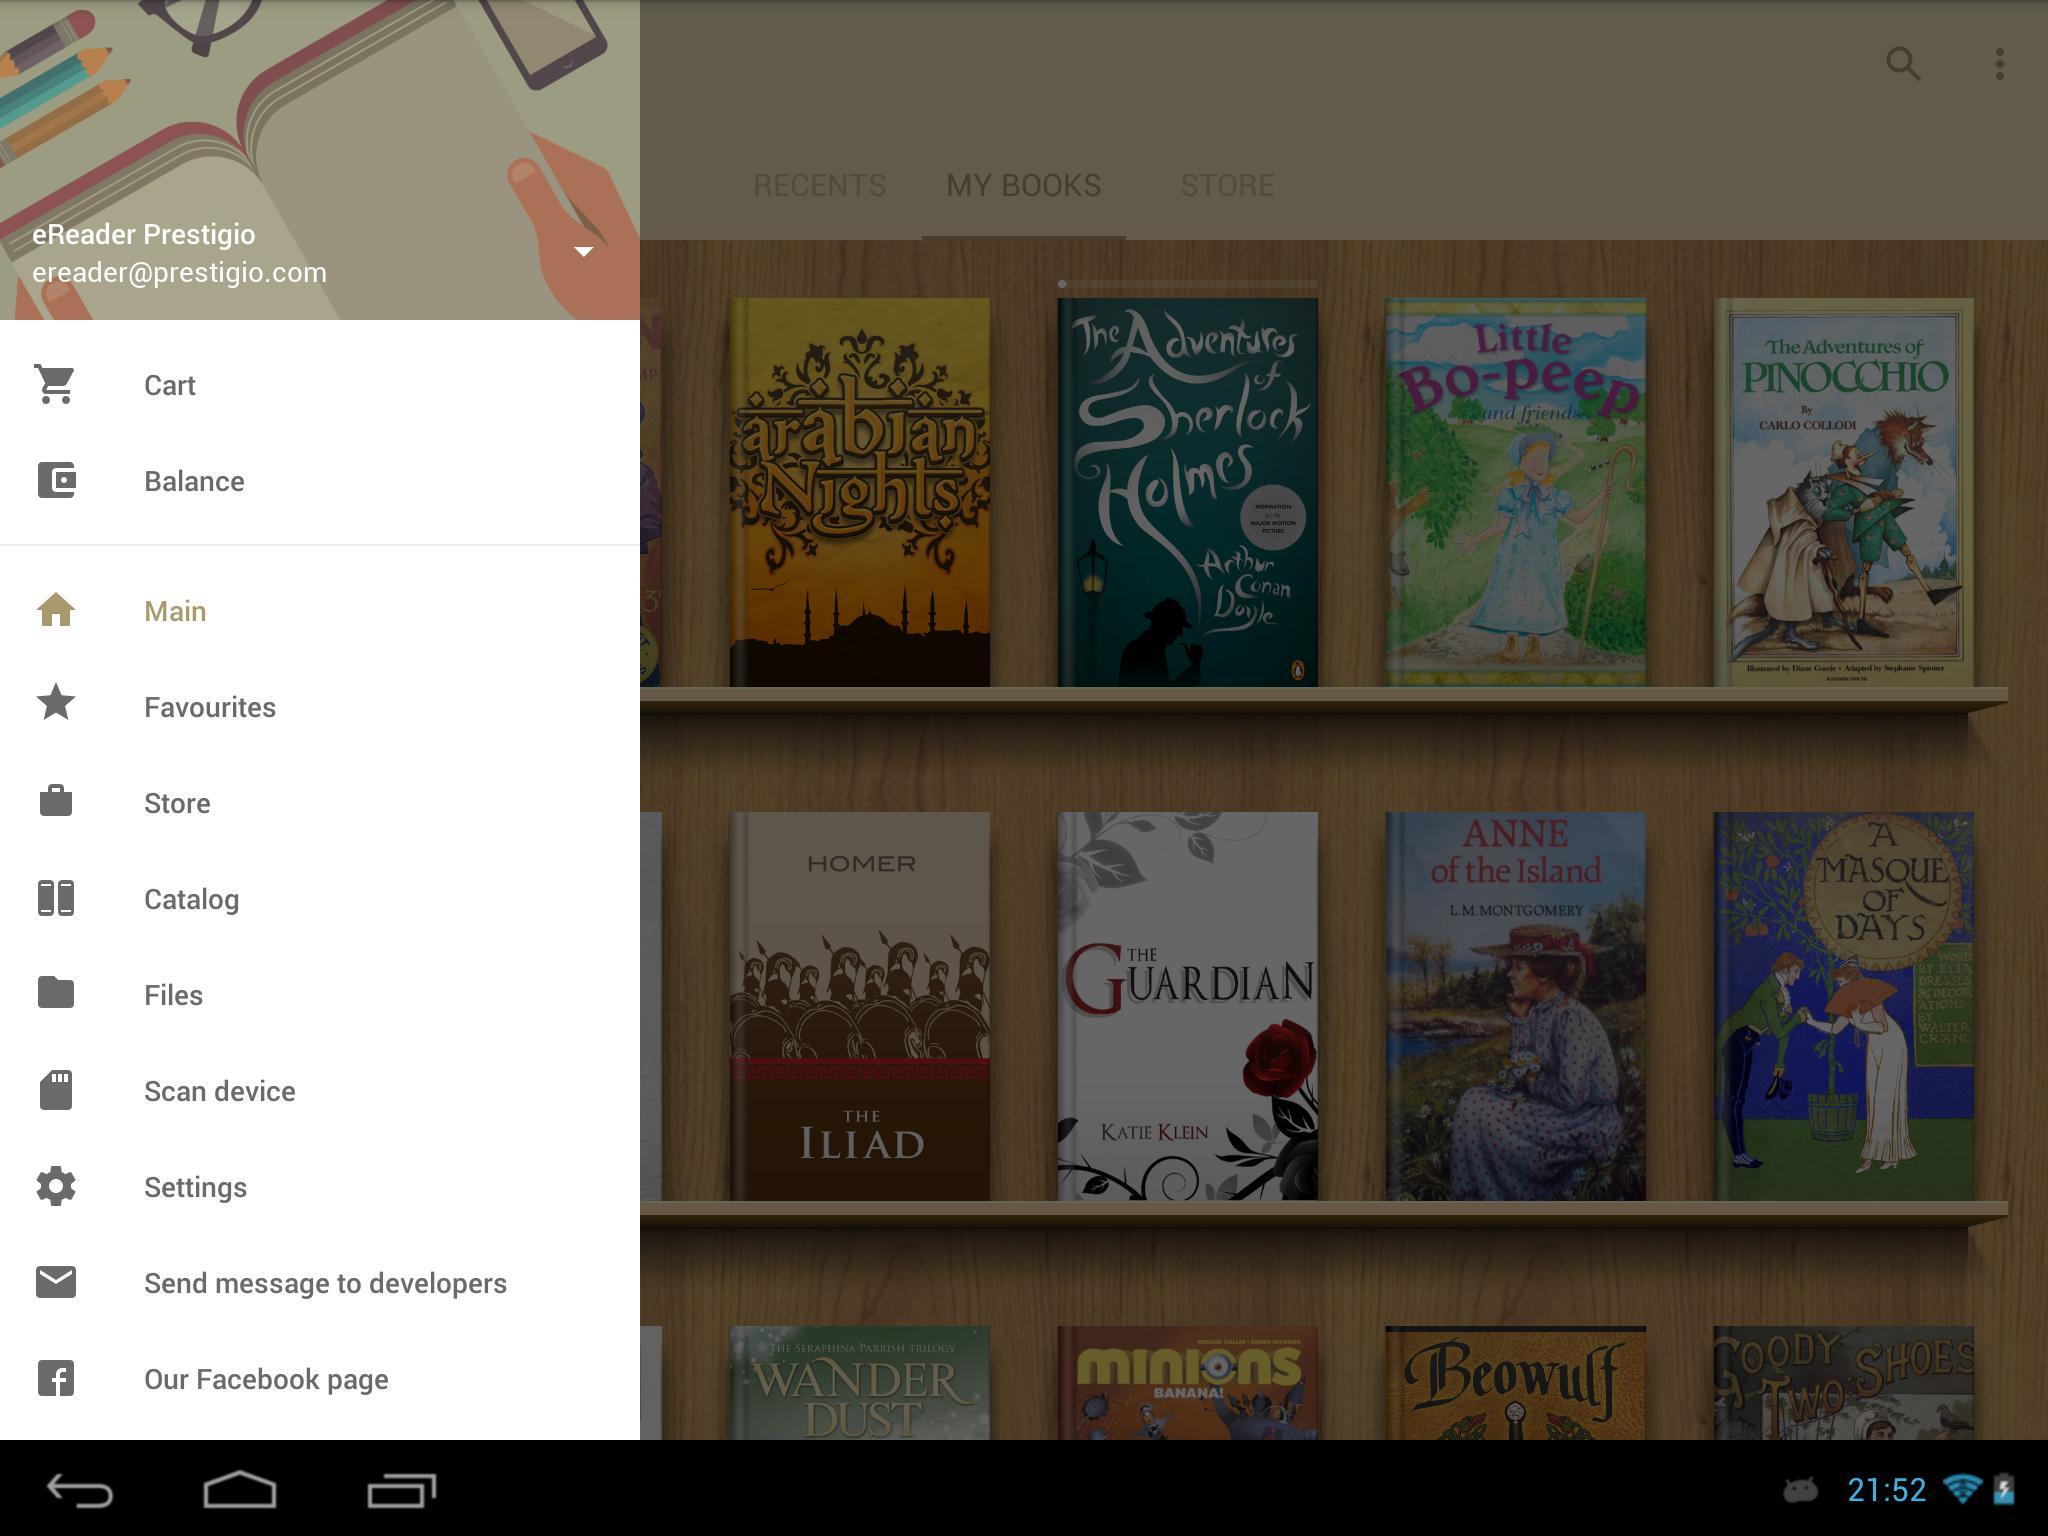 eReader Prestigio Book Reader 6.3.0 Screenshot 12